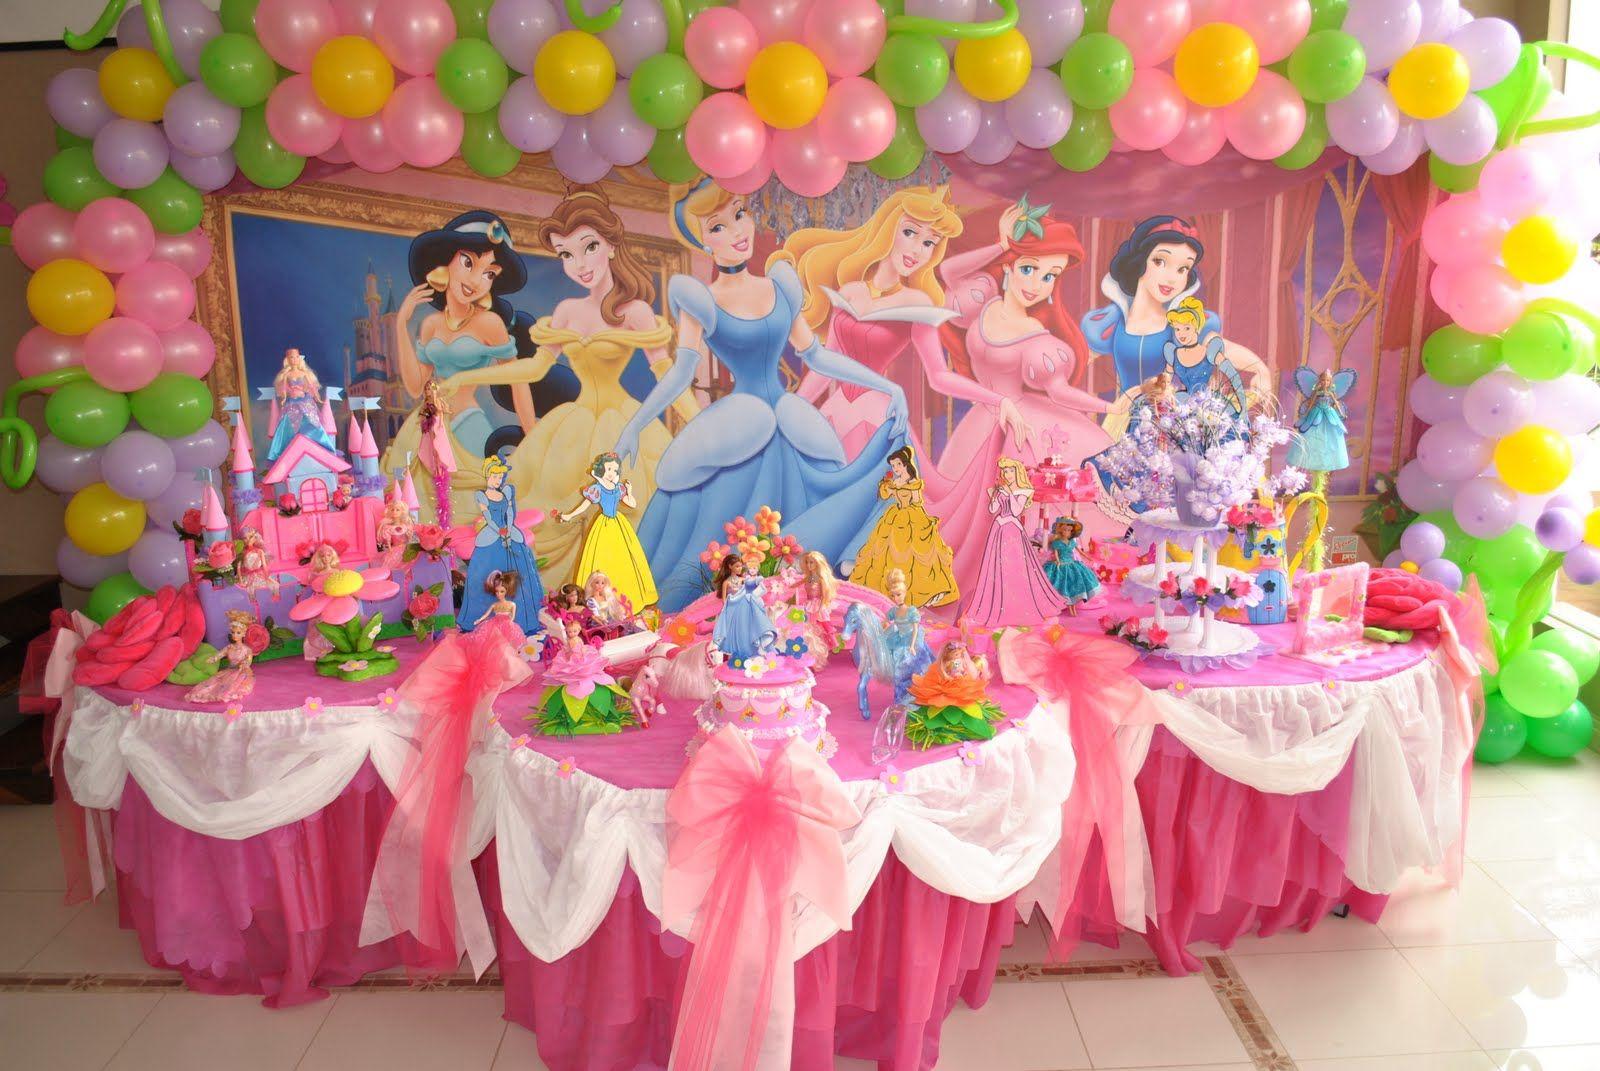 Kids Party Disney Princesses Decor Princess Theme Party